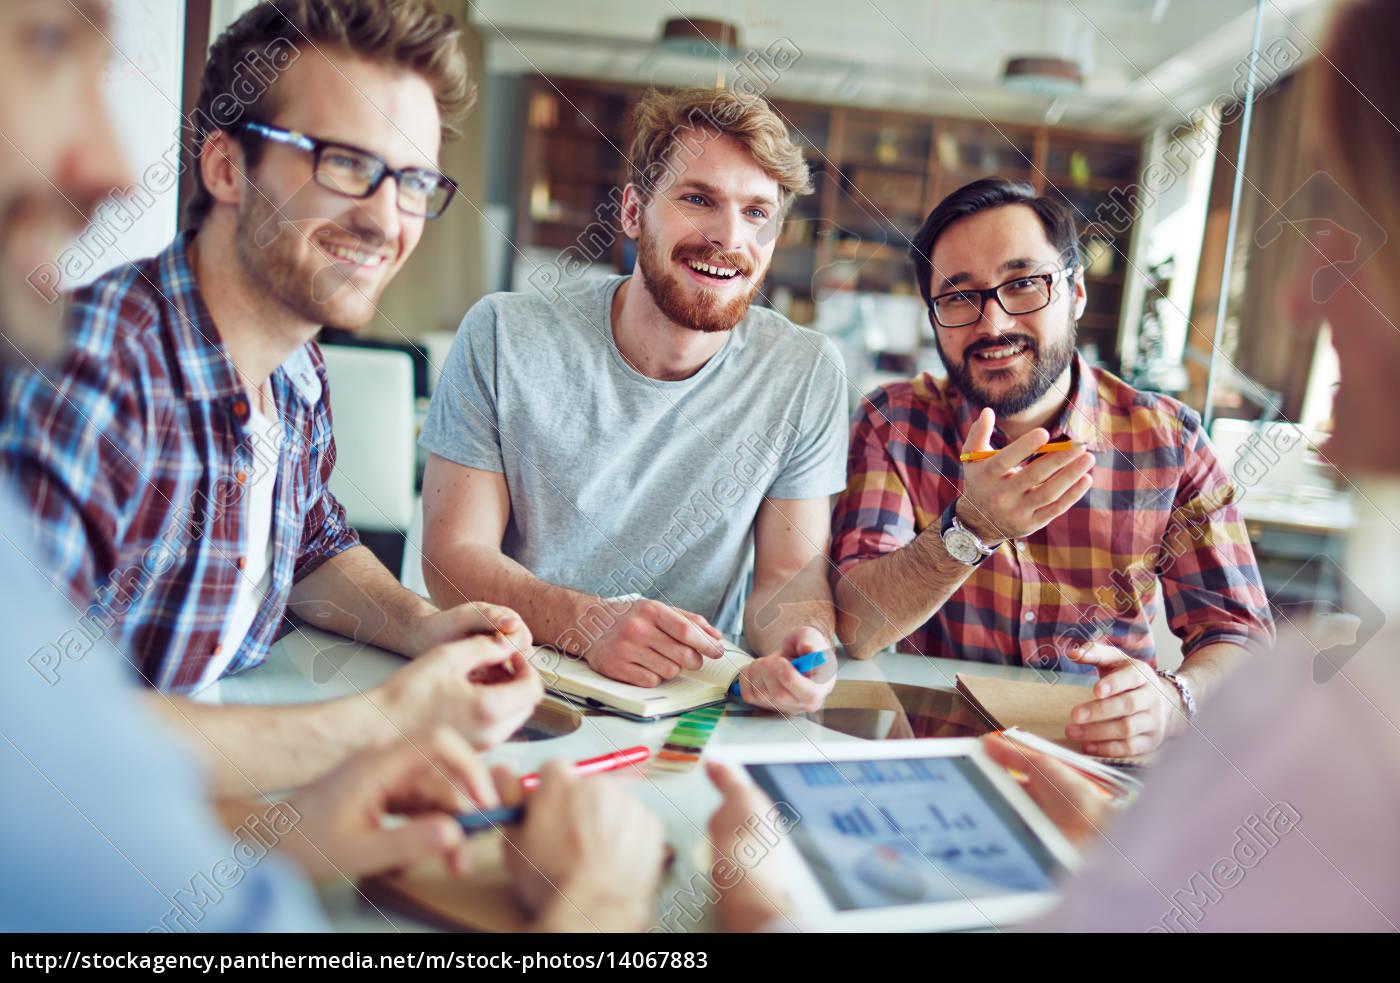 businessmen, at, meeting - 14067883